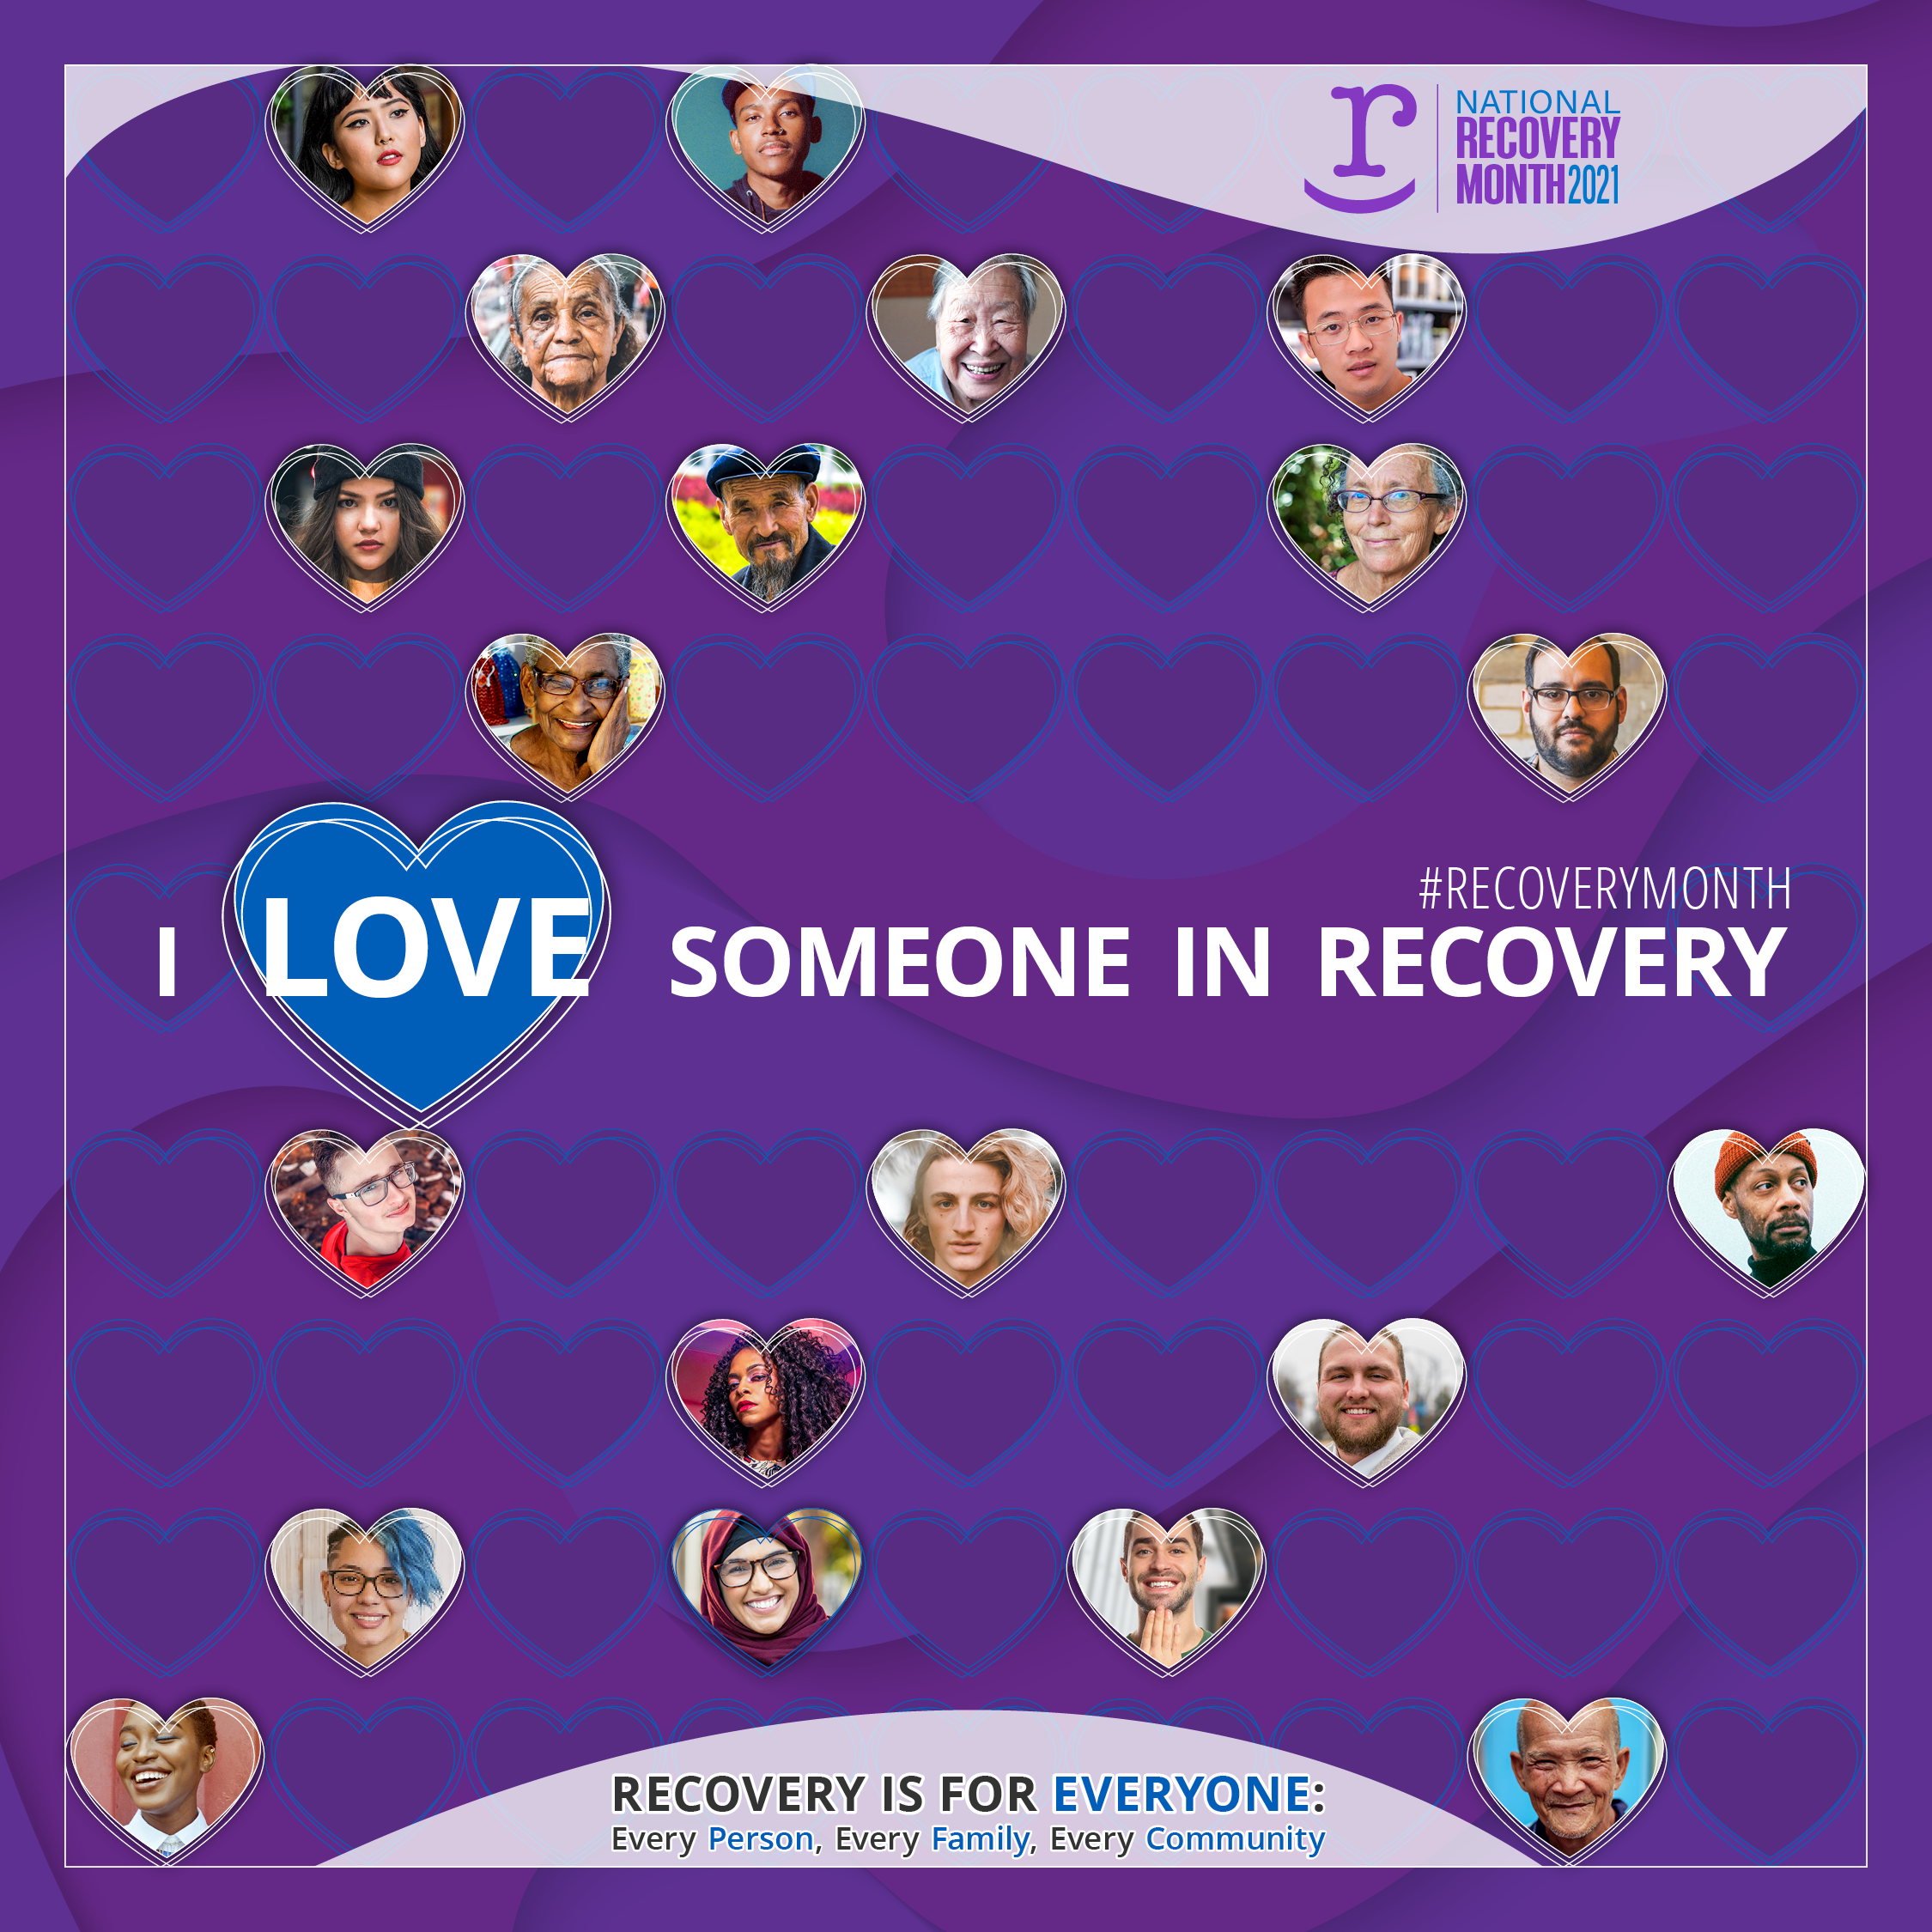 083021_love_recovery-month_social-media_ig_v1